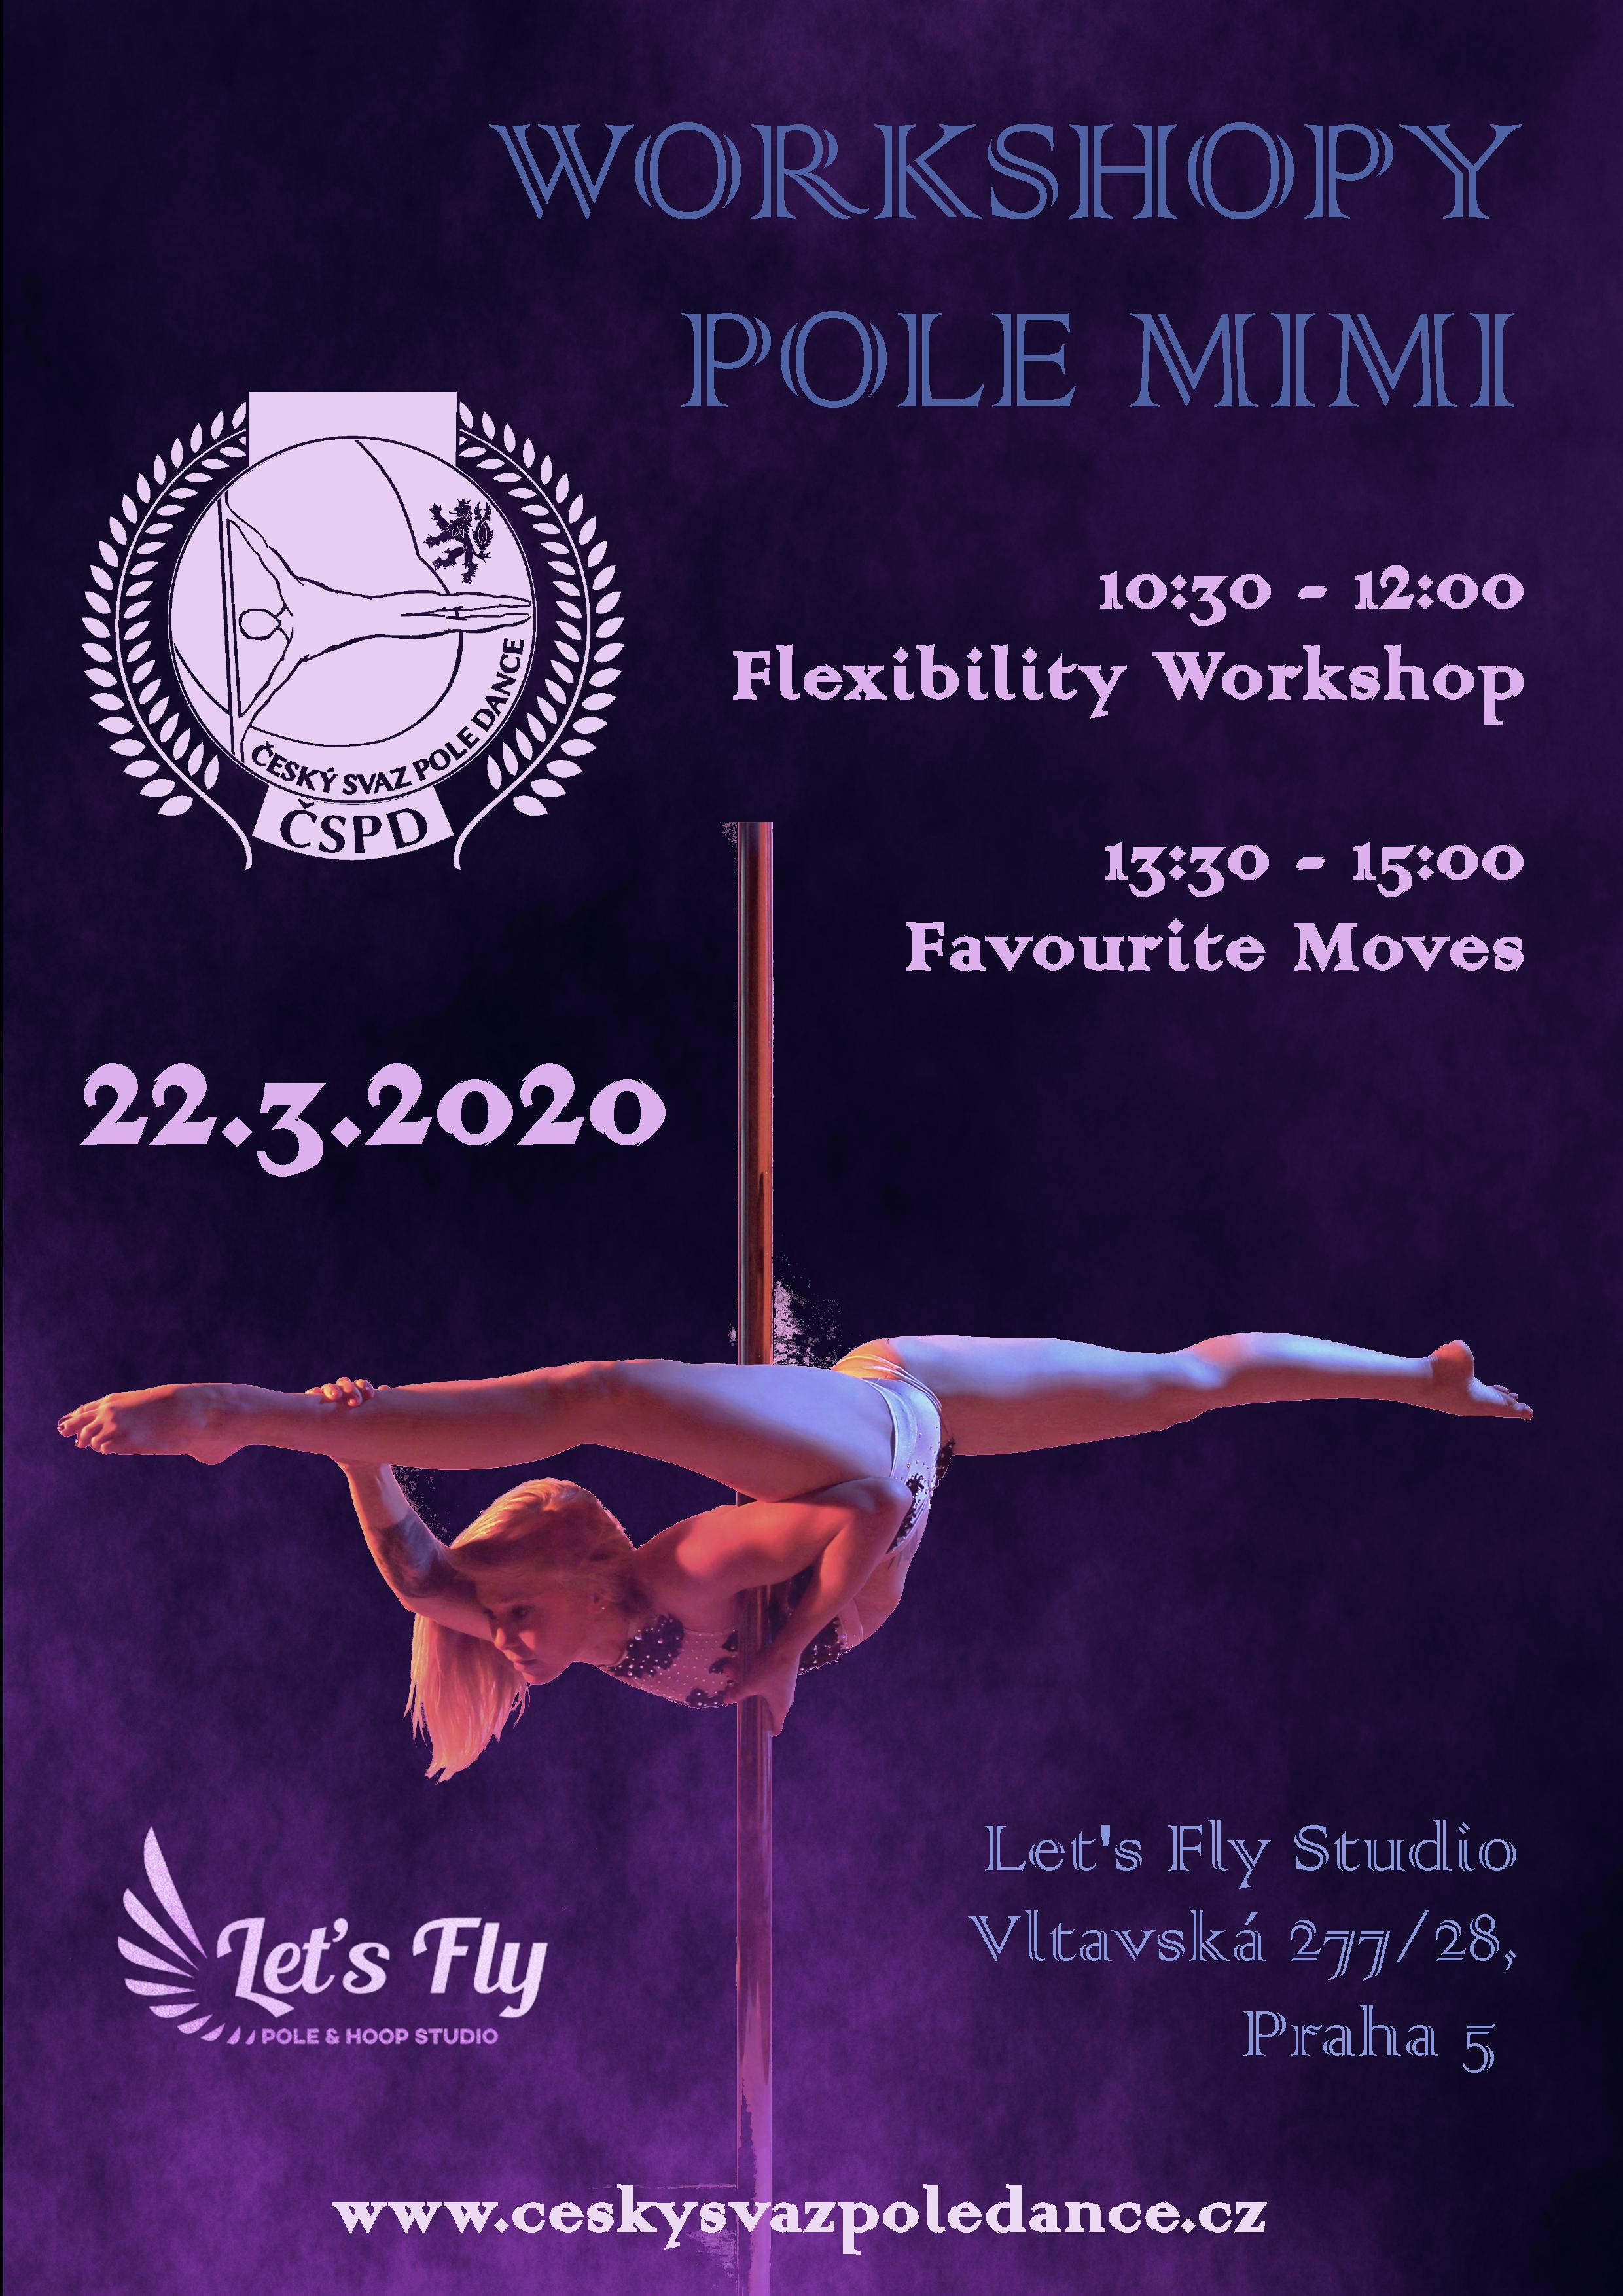 Workshopy Pole Mimi Carolin Schmitt